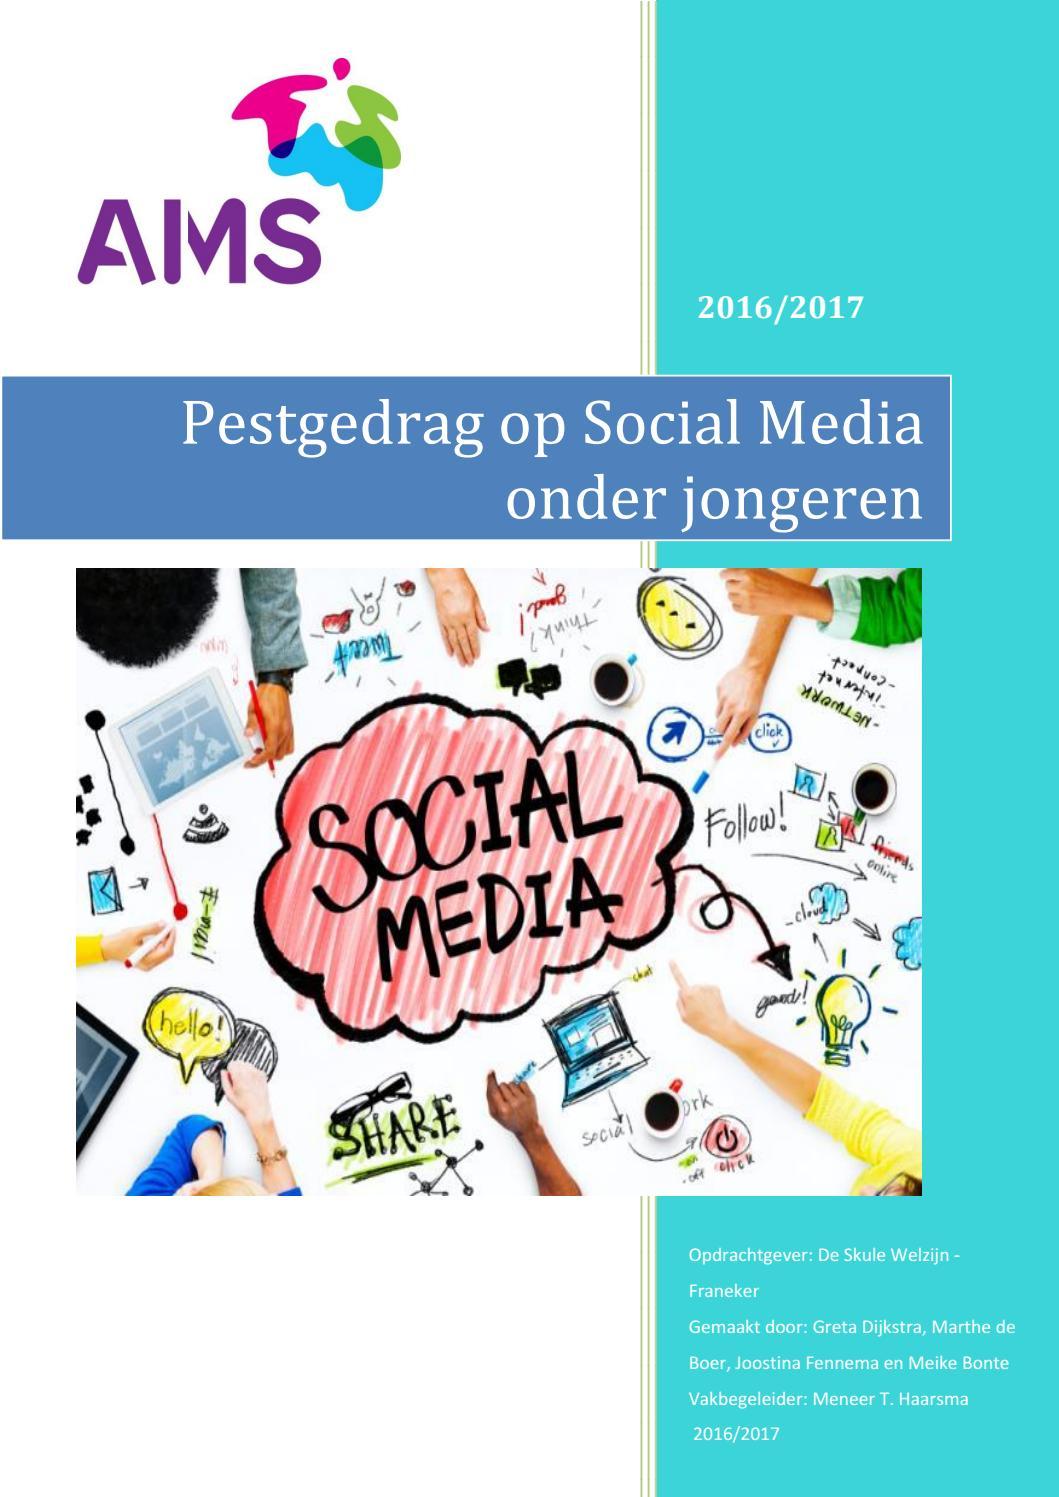 ams pws pestgedrag op social media onder jongeren greta dijkstra